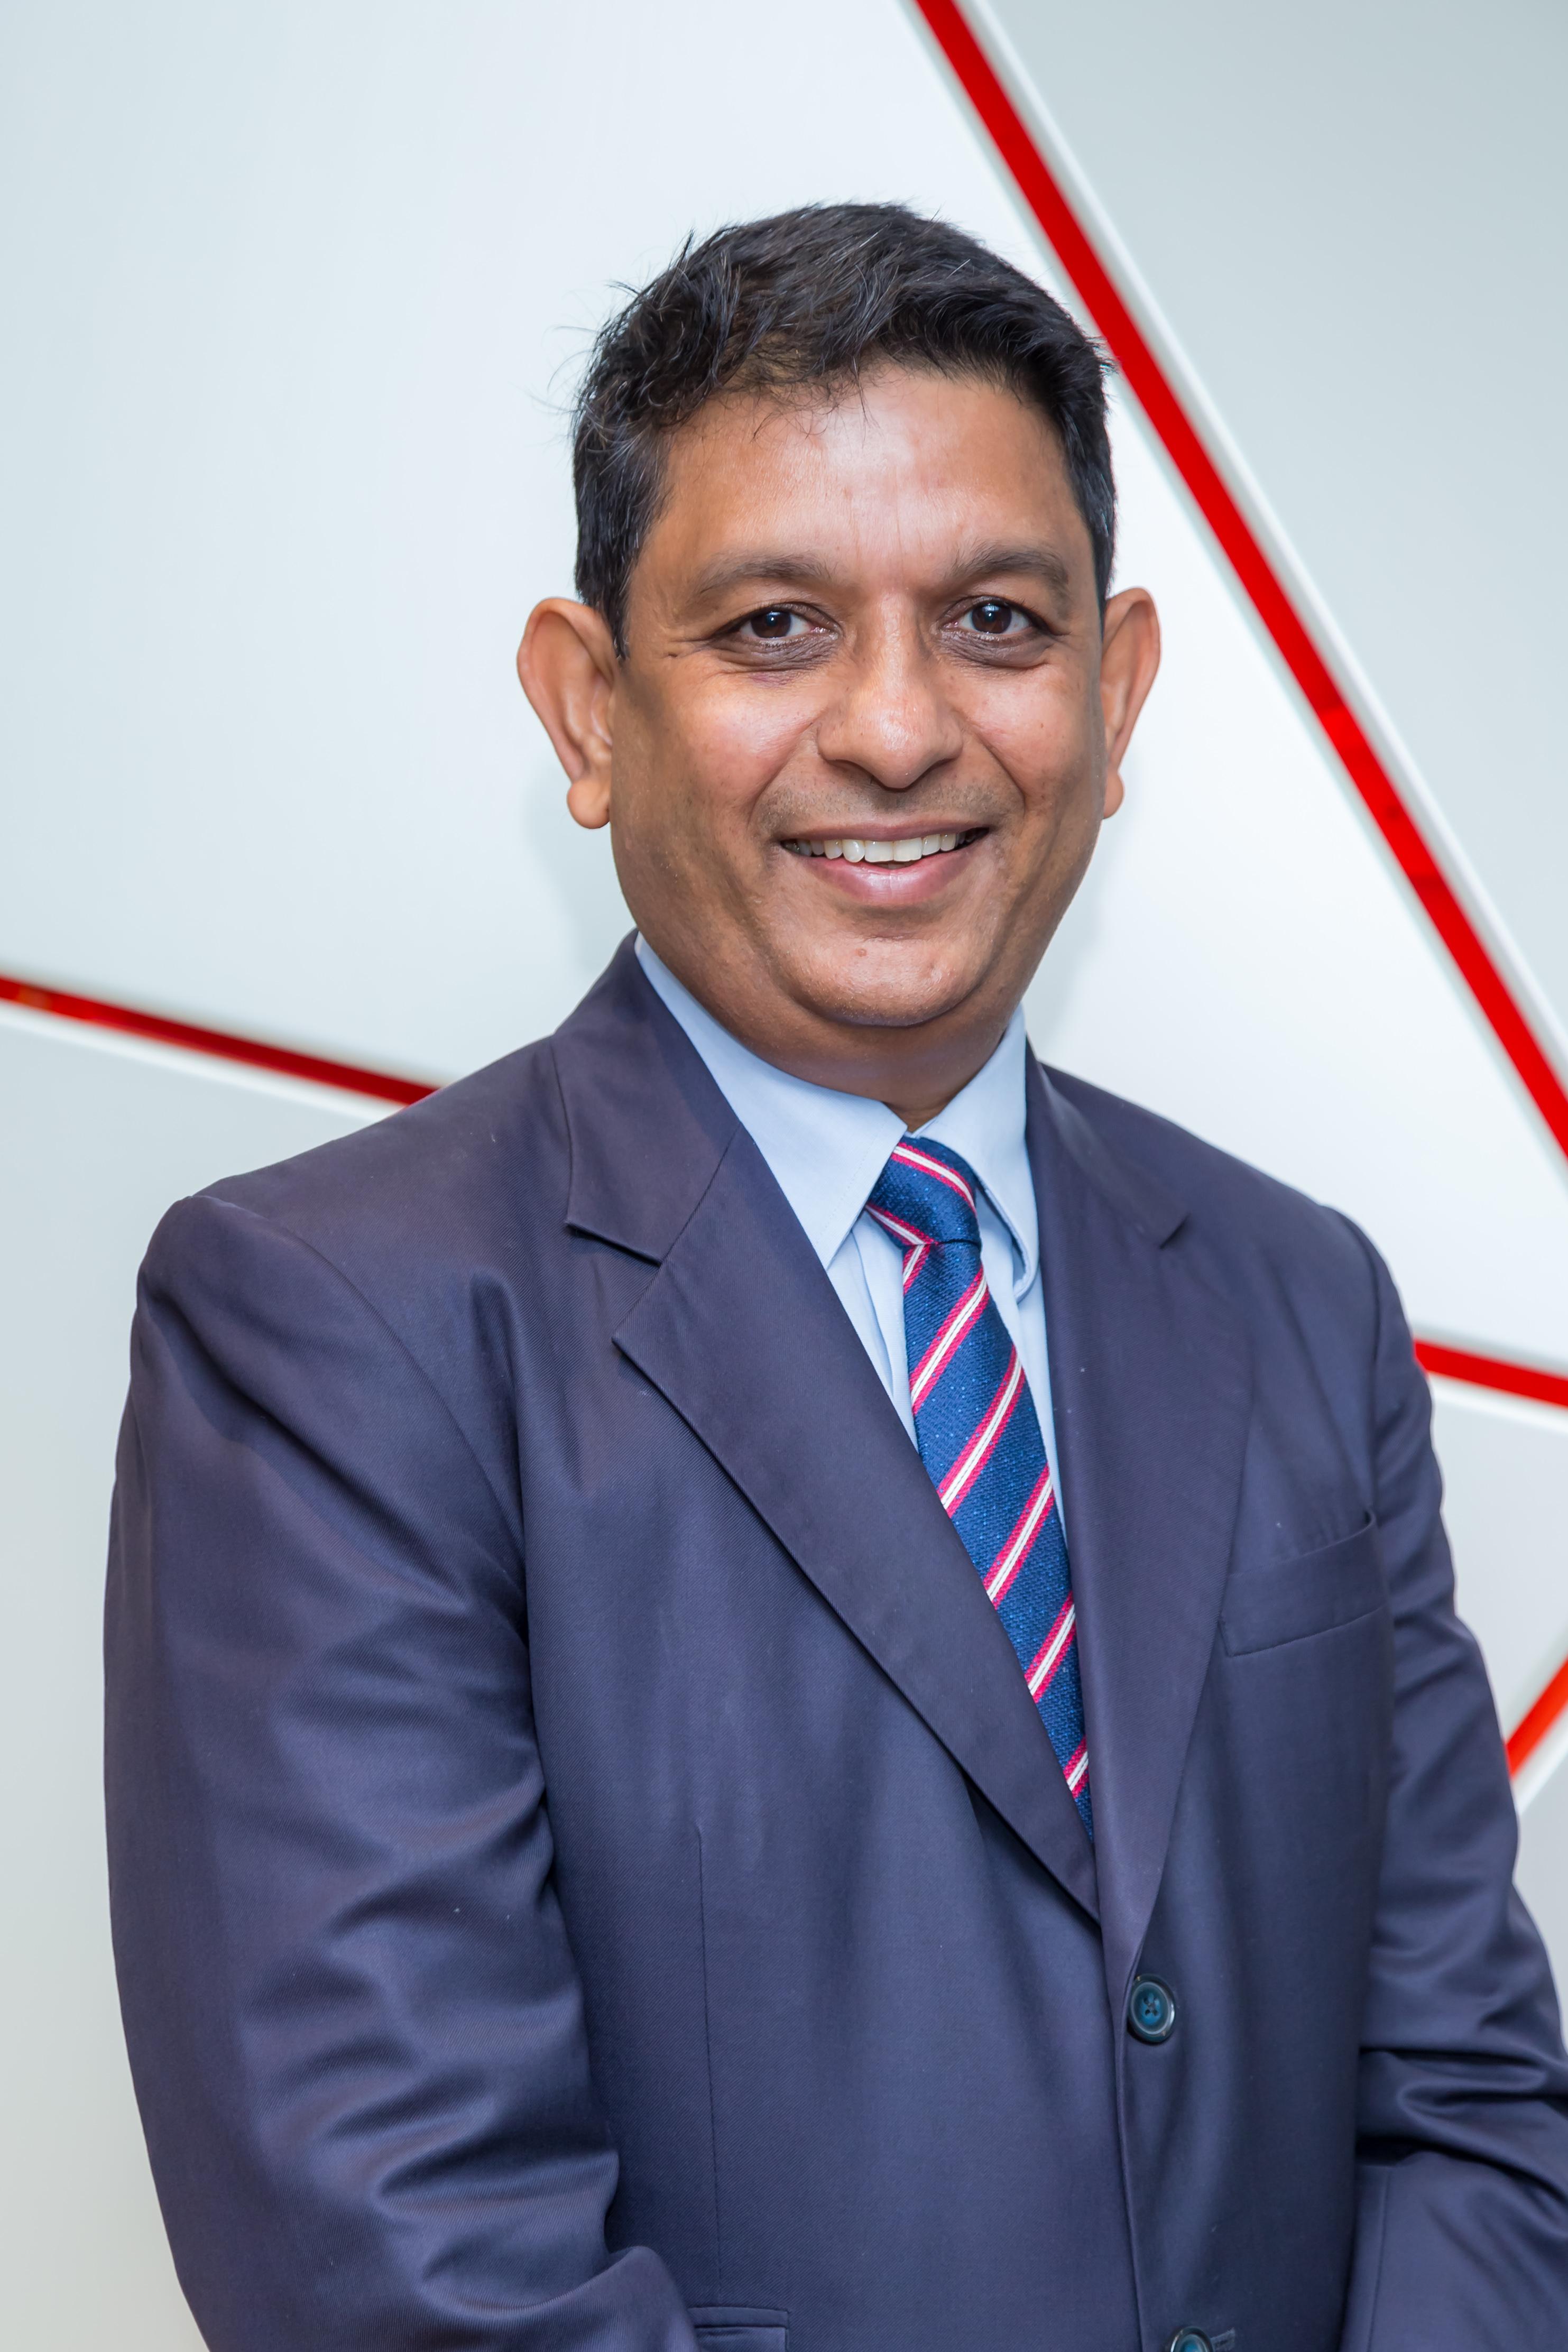 Dr Jain